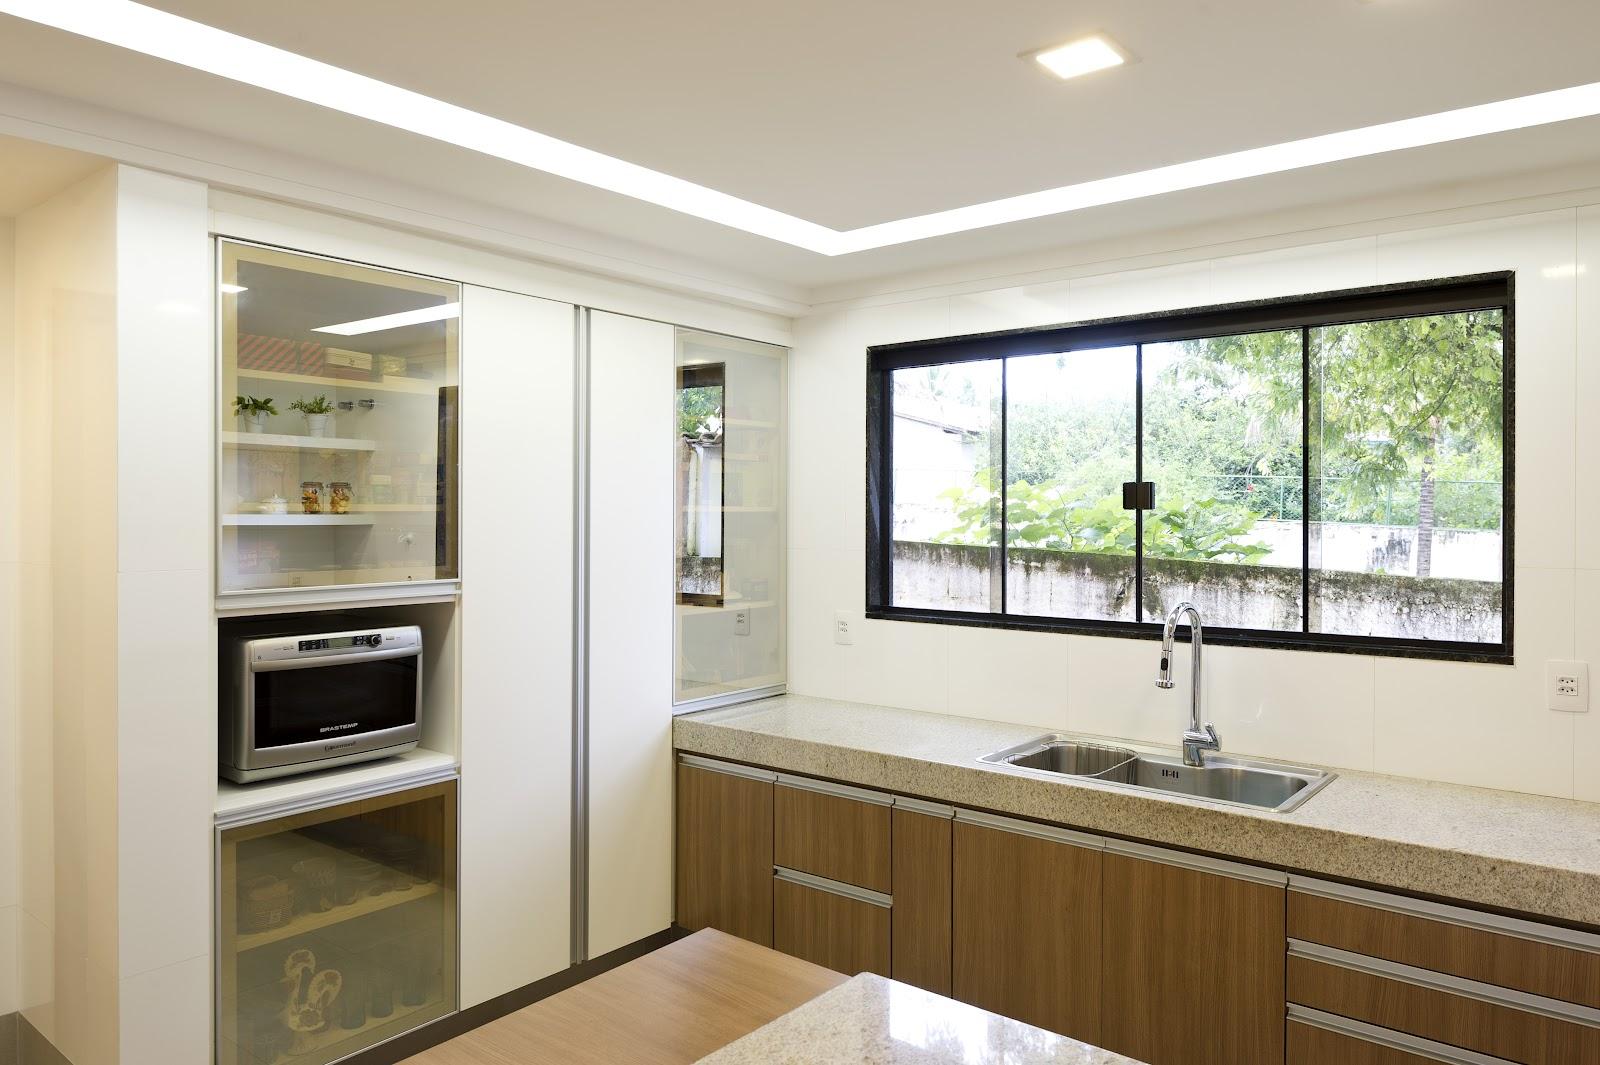 Projeto Cozinha Sr. Yuki Mukai #614724 1600 1065